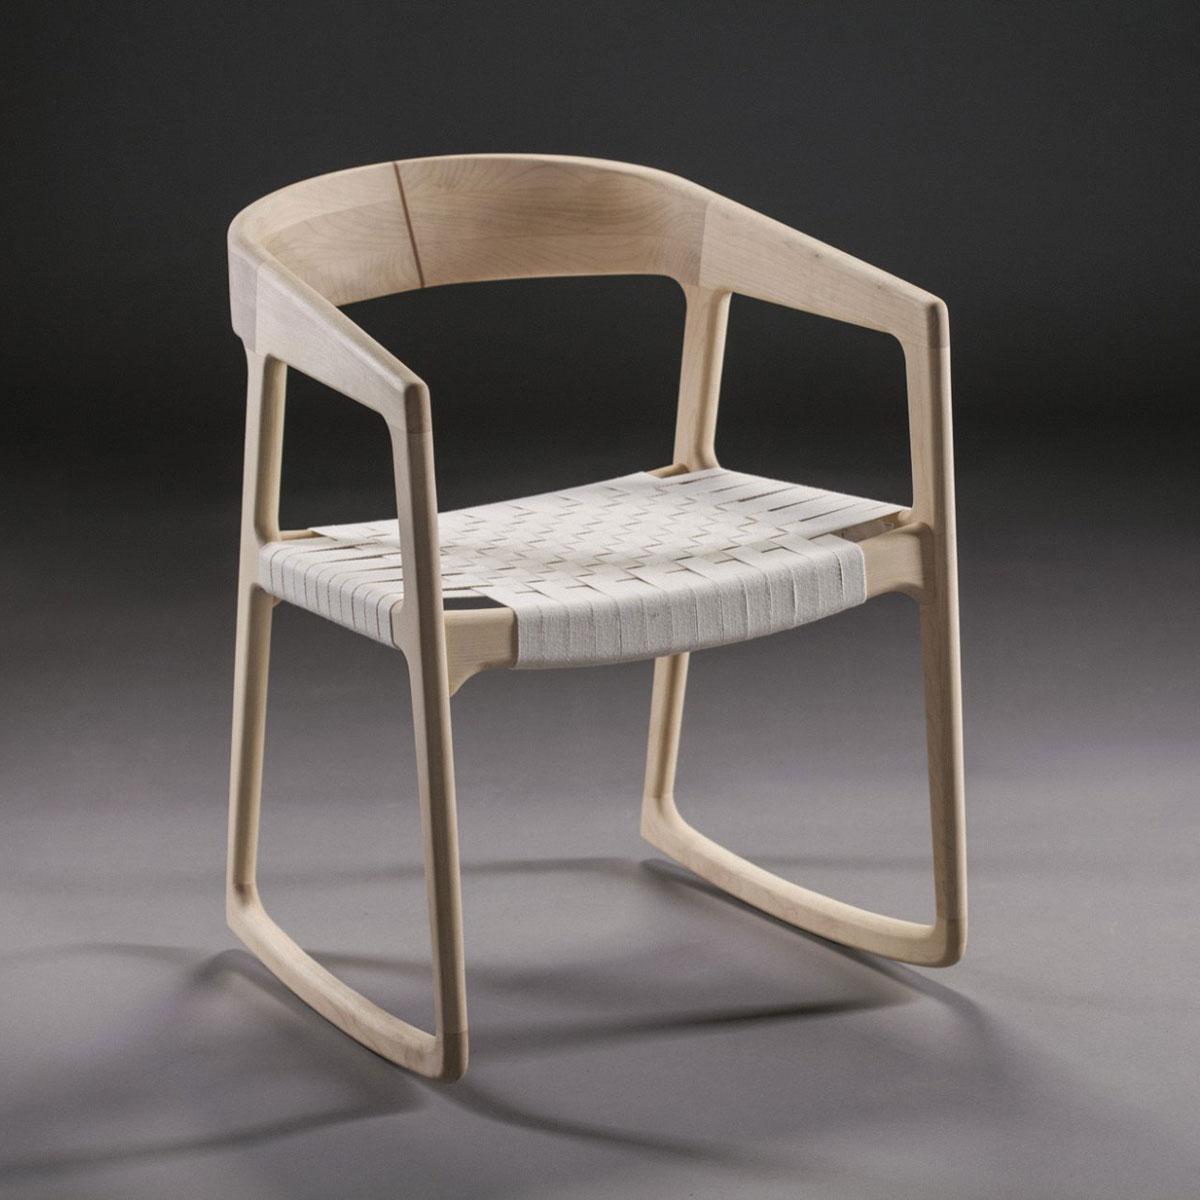 Silla tesa swinging en madera y diferentes textiles para for Diseno de sillas modernas de madera